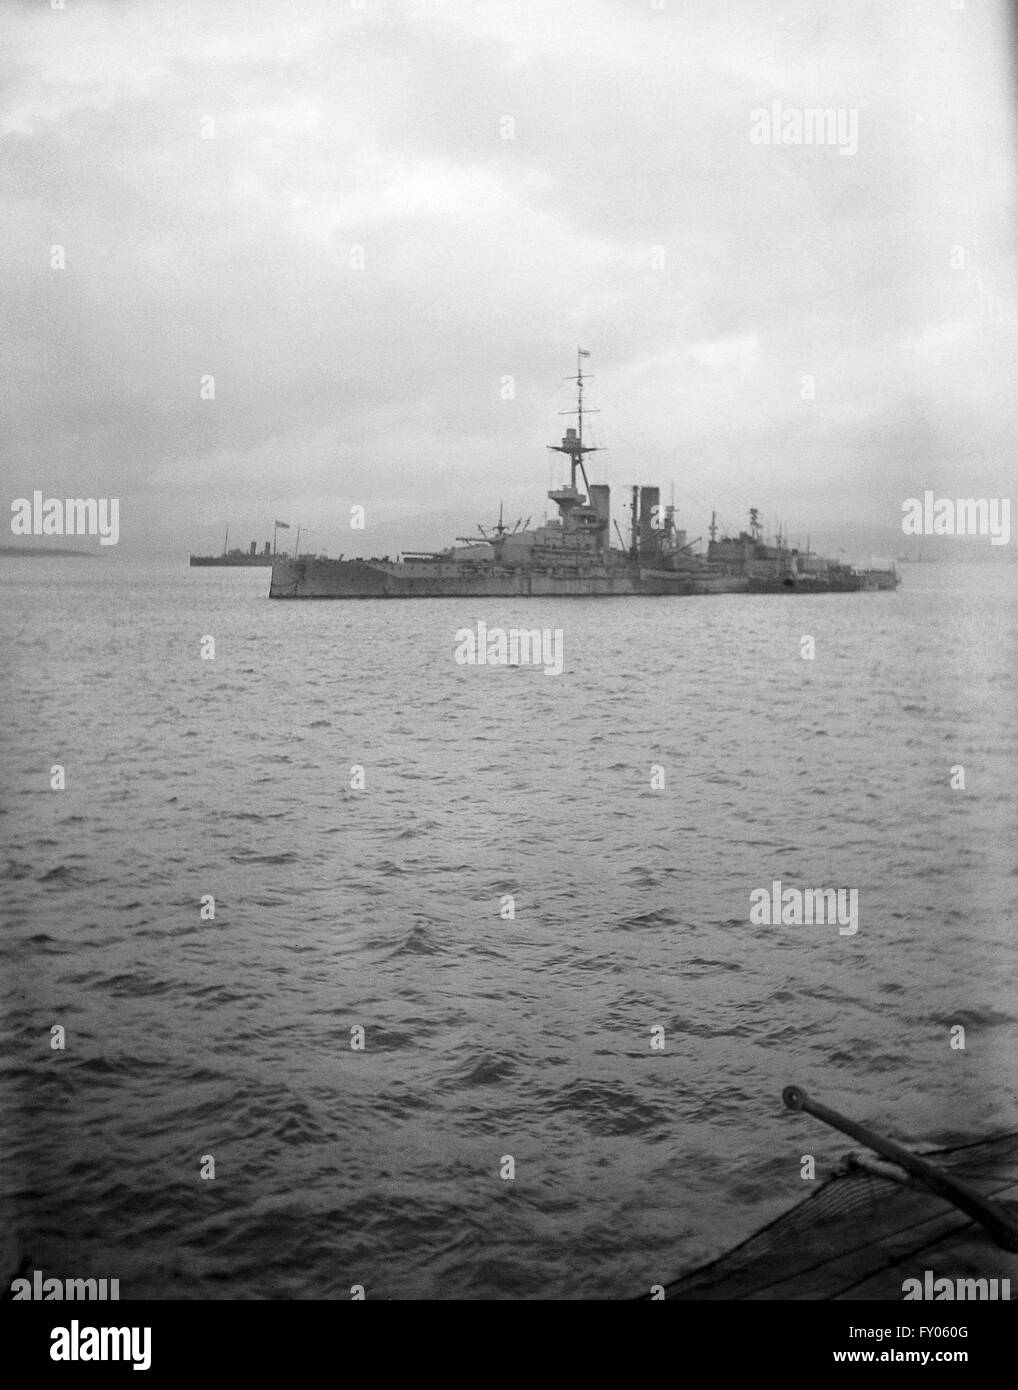 AJAXNETPHOTO.1914 -1918. LOCH SWILLY, NORTHERN IRELAND. - DREADNOUGHT CLASS BATTLESHIP HMS IRON DUKE AT ANCHOR, - Stock Image